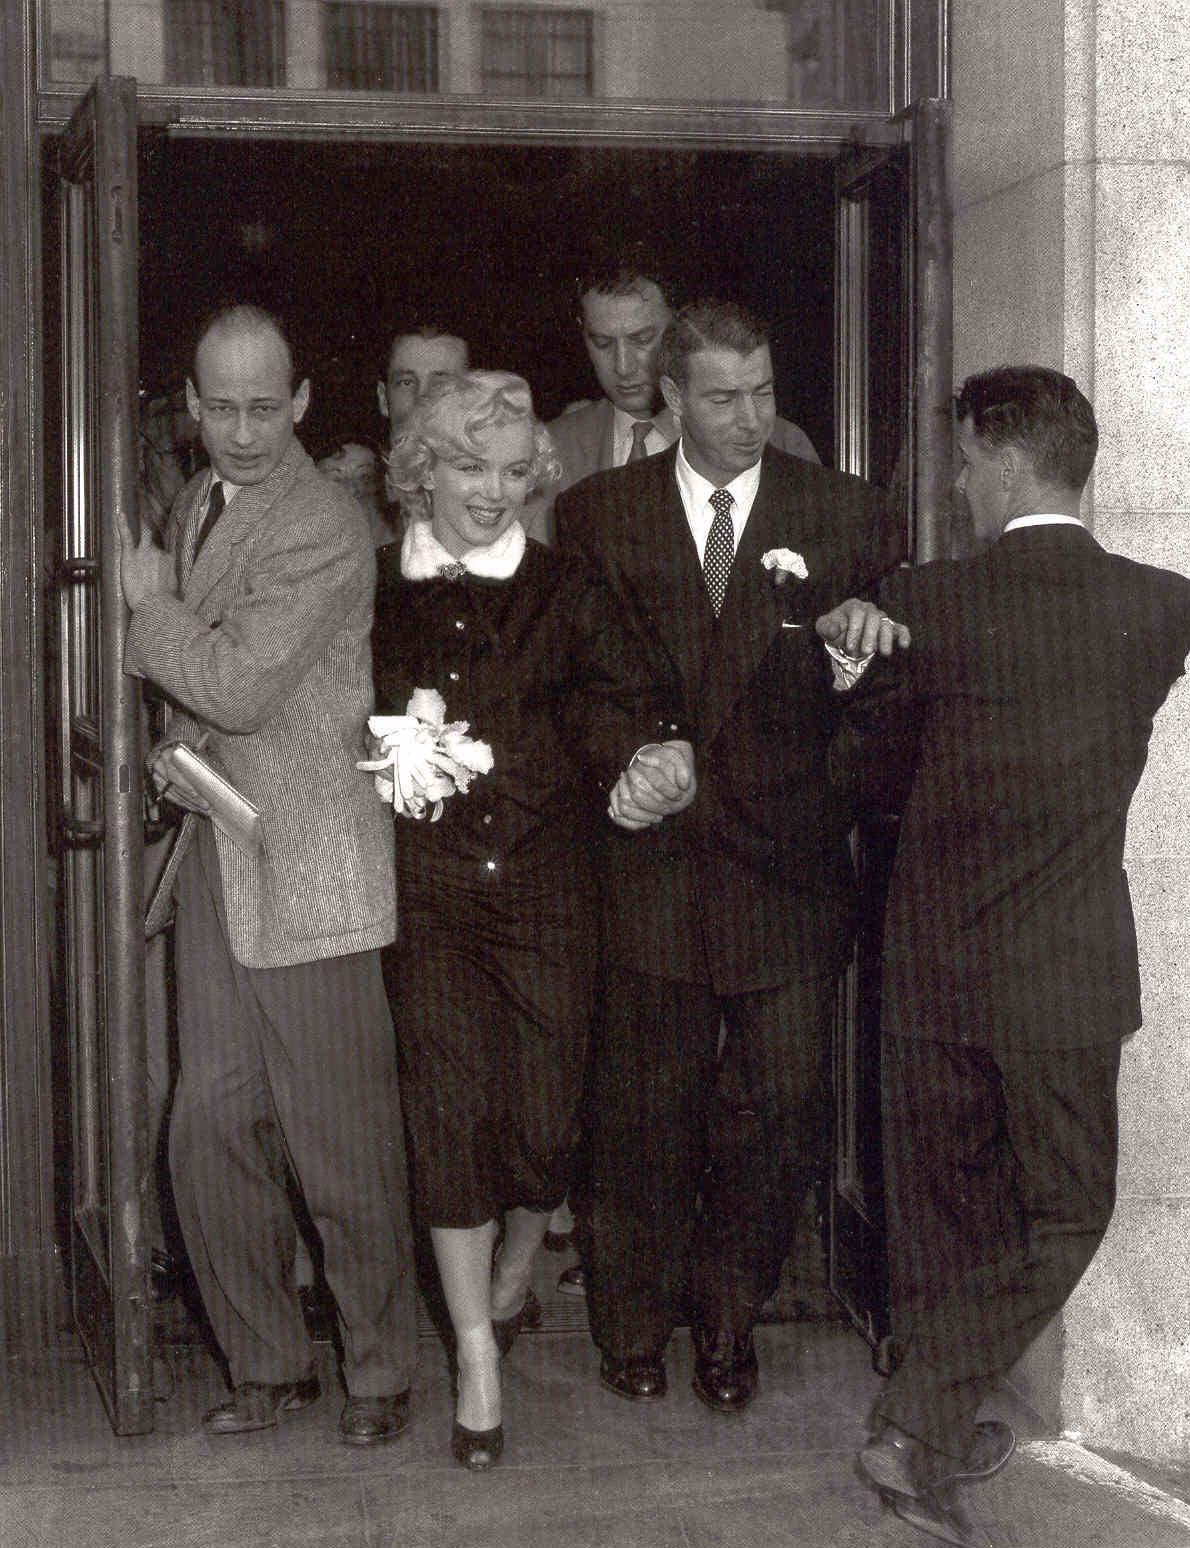 Wedding Day For Marilyn Monroe And Joe Dimaggio San Francisco January 14 1954